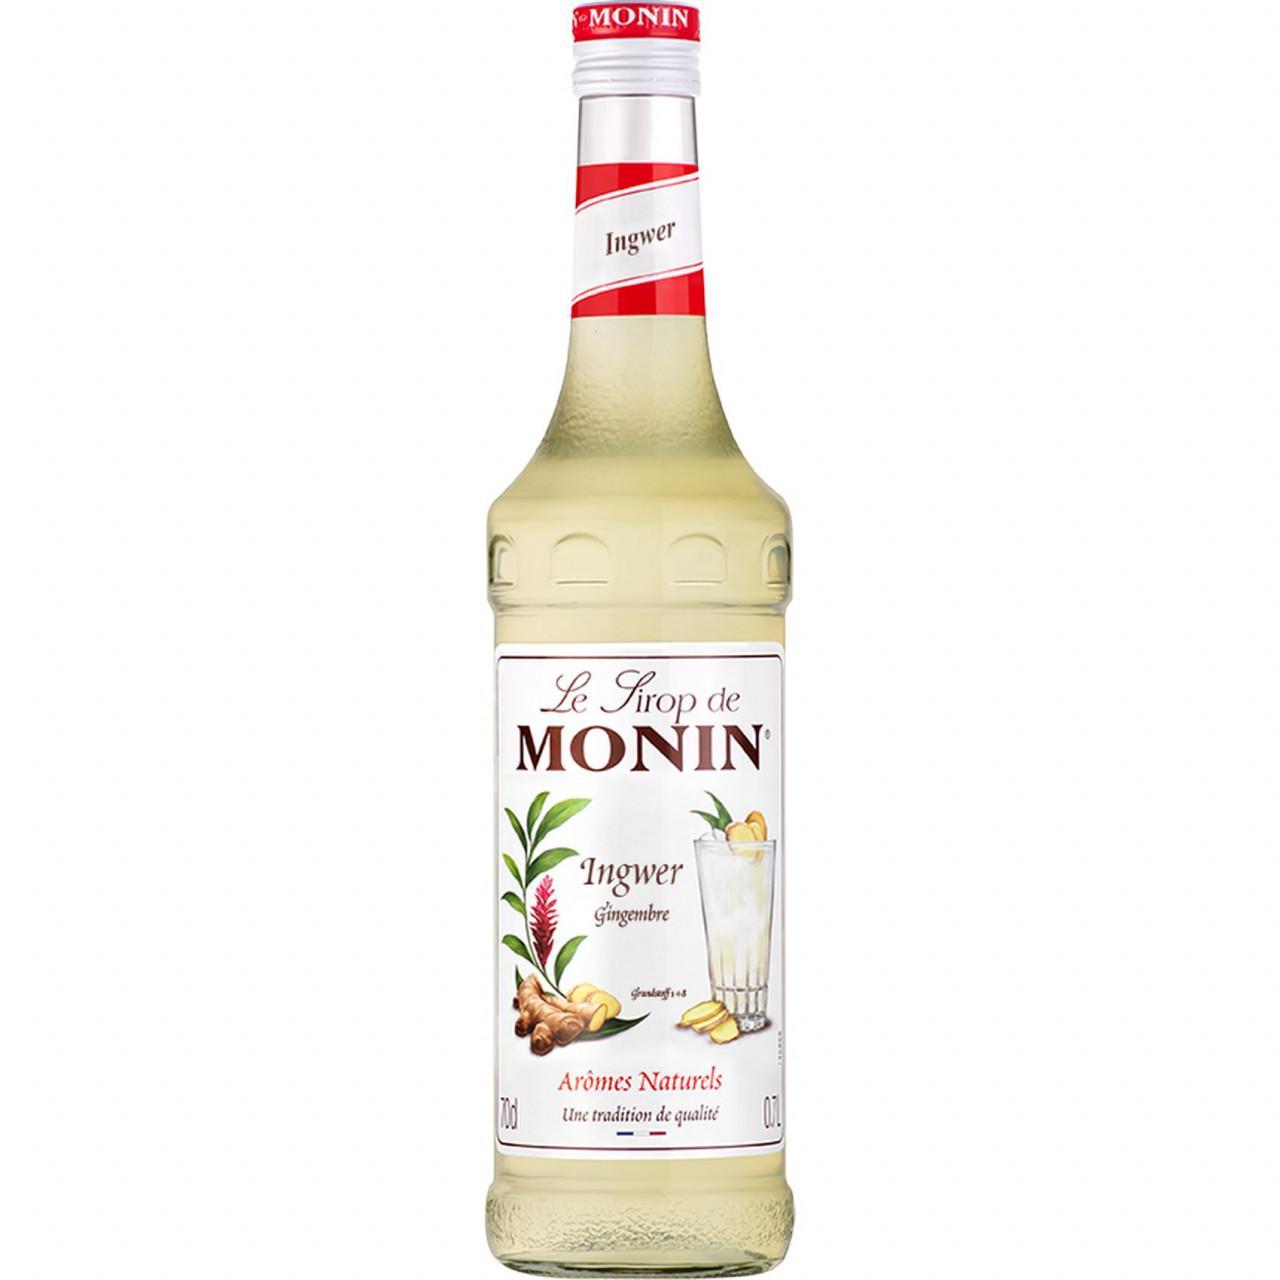 Monin Ingwer Sirup 1x 0,7l